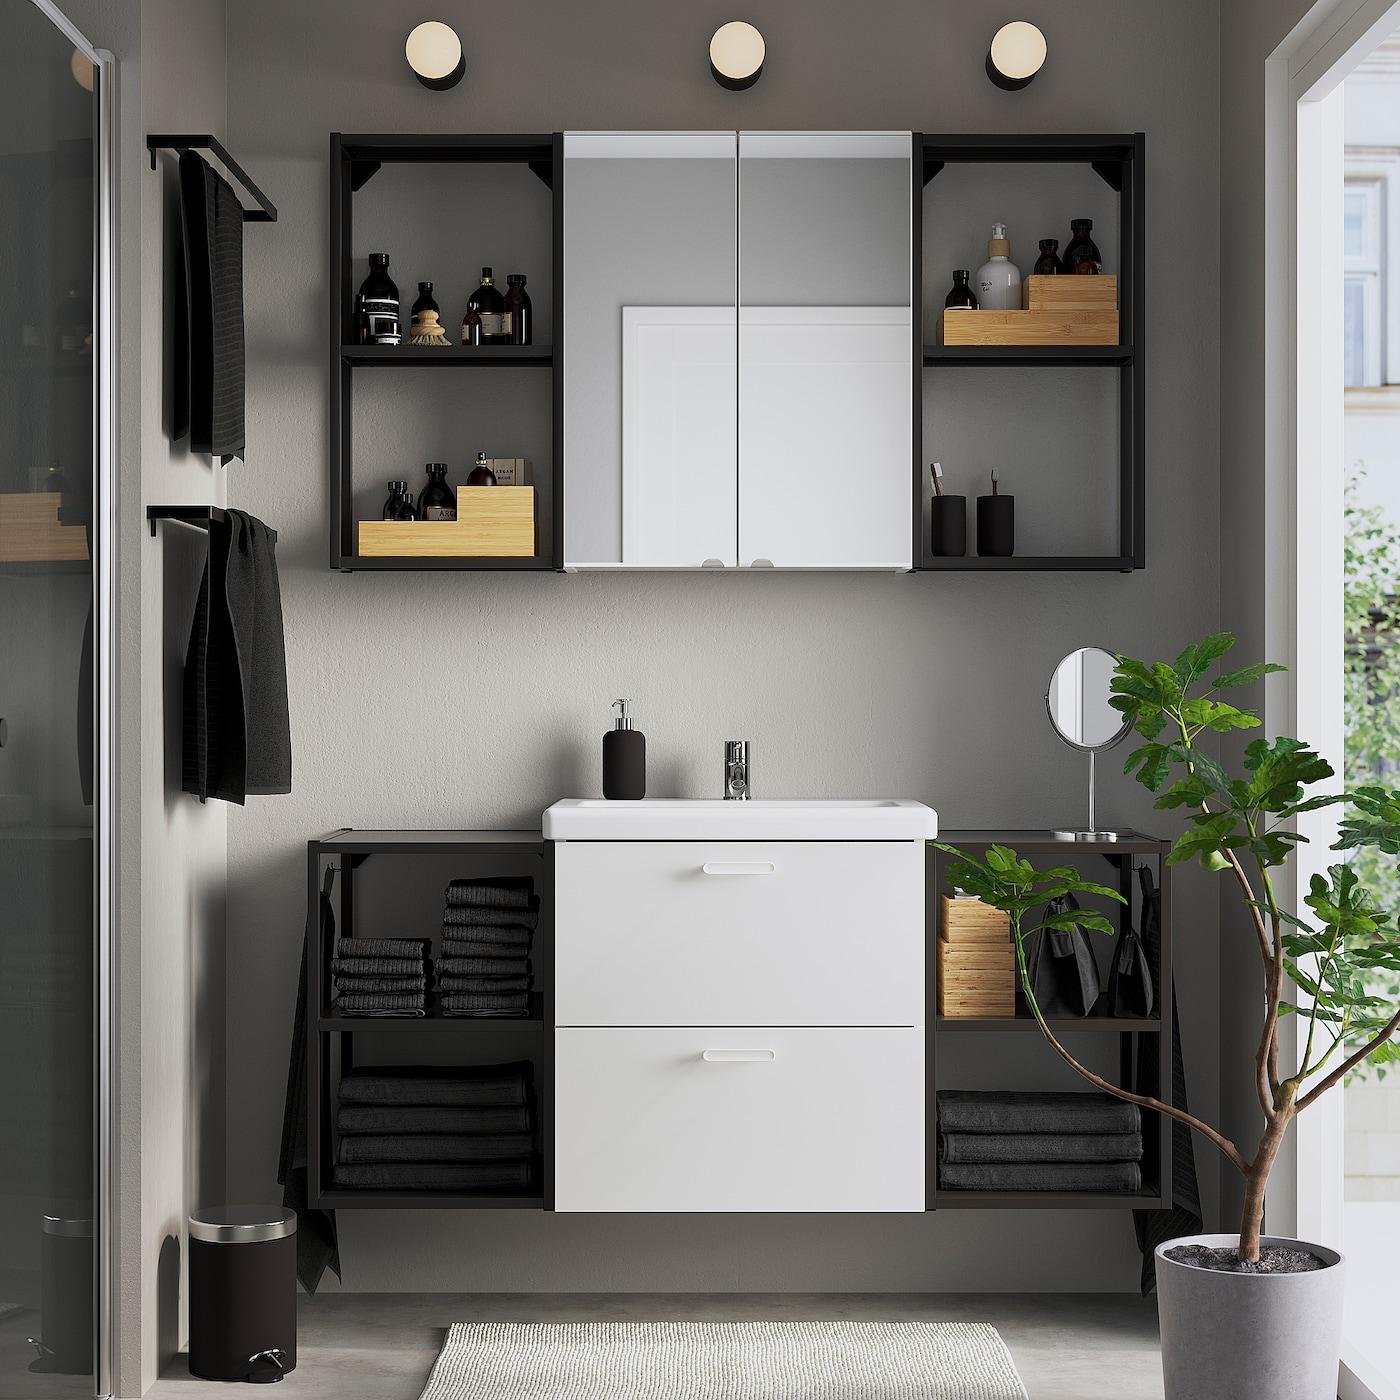 ENHET / TVÄLLEN Nábytok do kúpeľne, 18-d súpr, biela/antracit Batérie PILKÅN, 140x43x65 cm